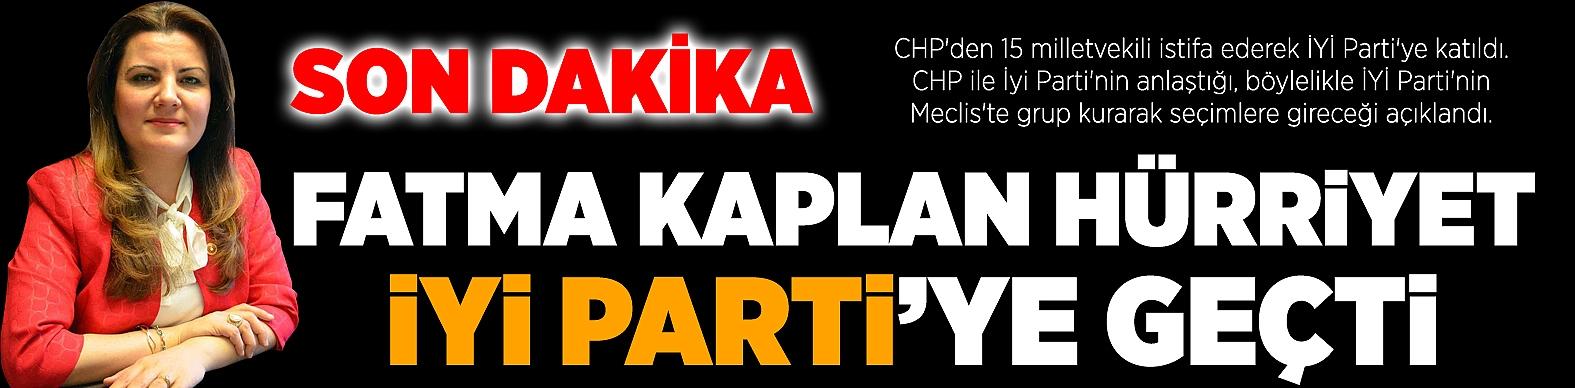 Fatma Kaplan Hürriyet İYİ Parti'ye geçti